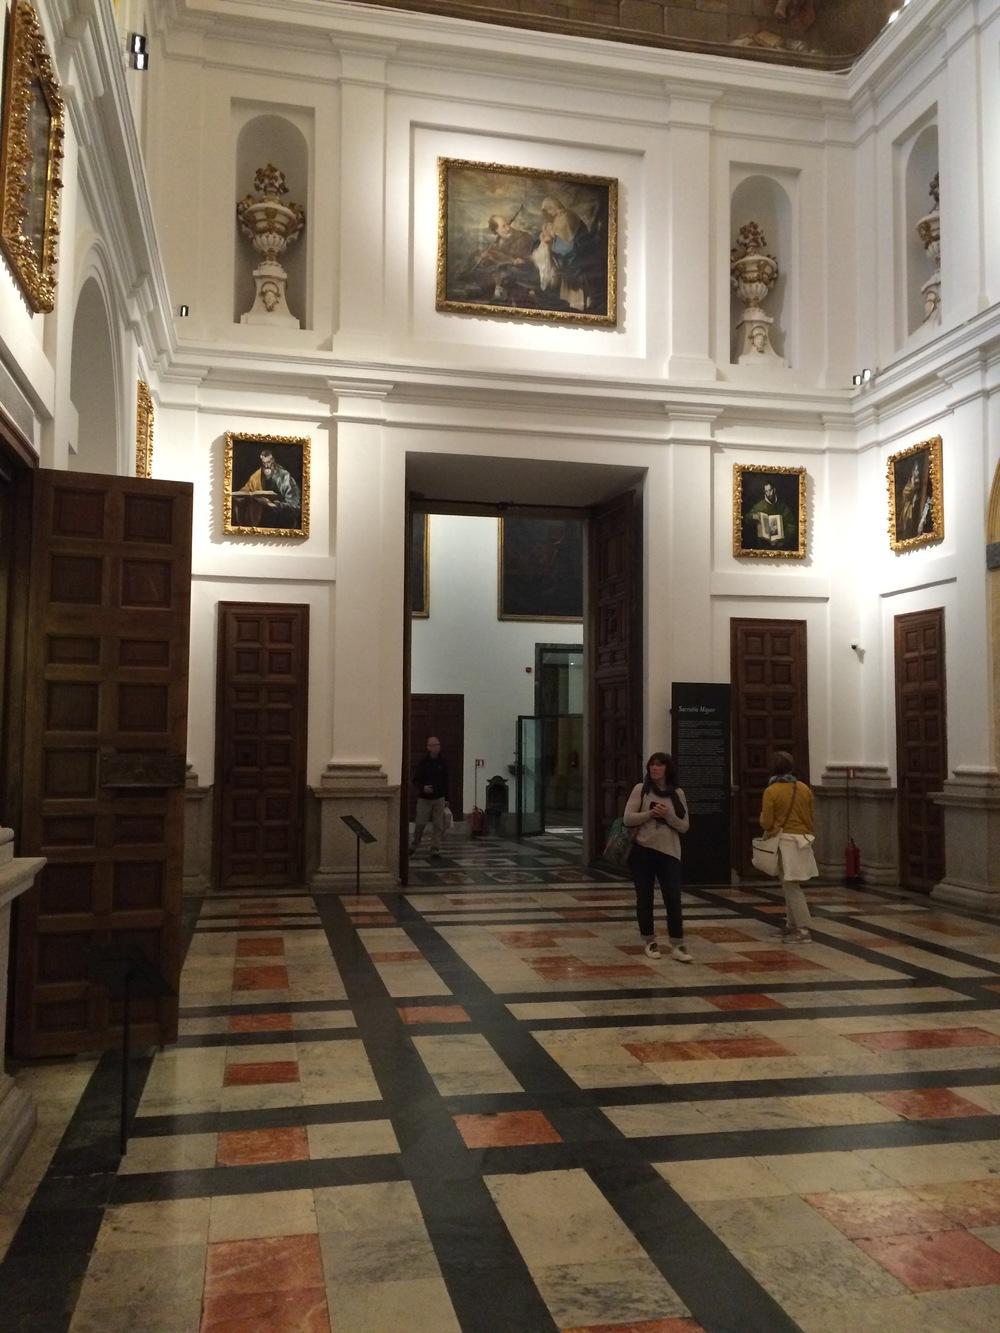 Ypunto_Sacristia_Mayor_Toledo_07.jpg